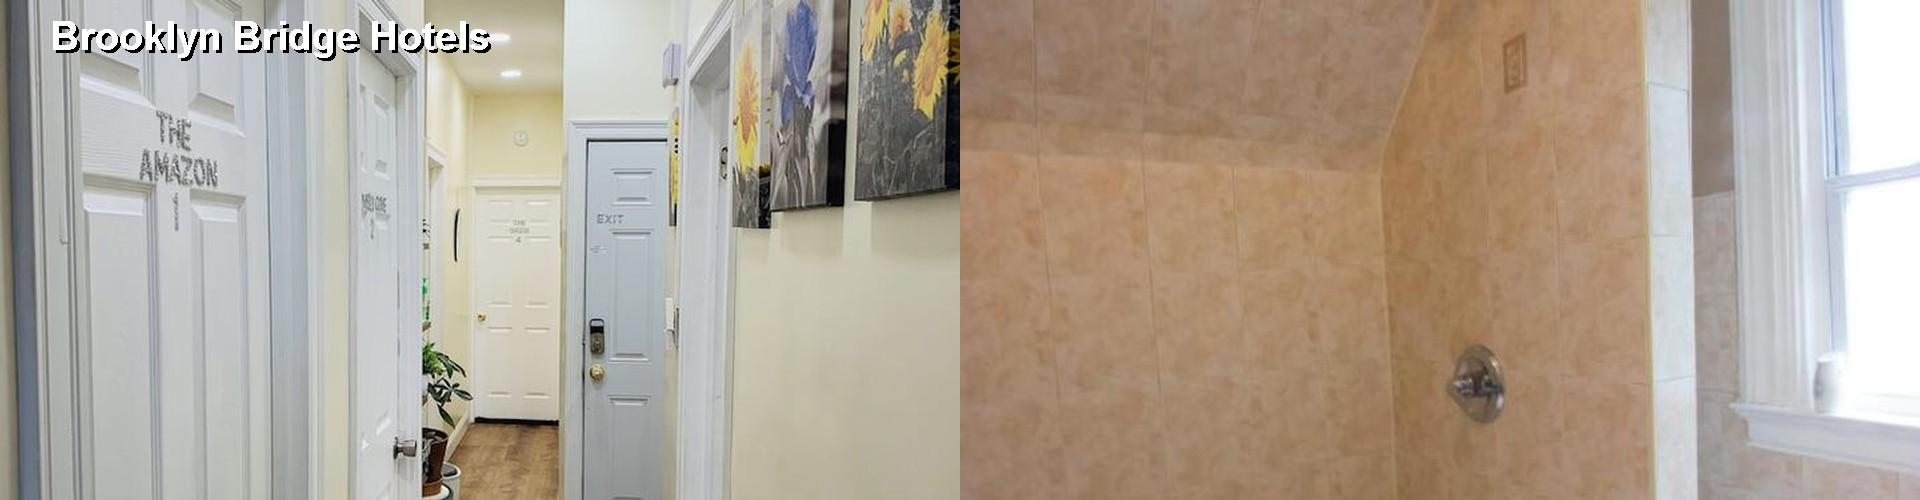 5 Best Hotels Near Brooklyn Bridge